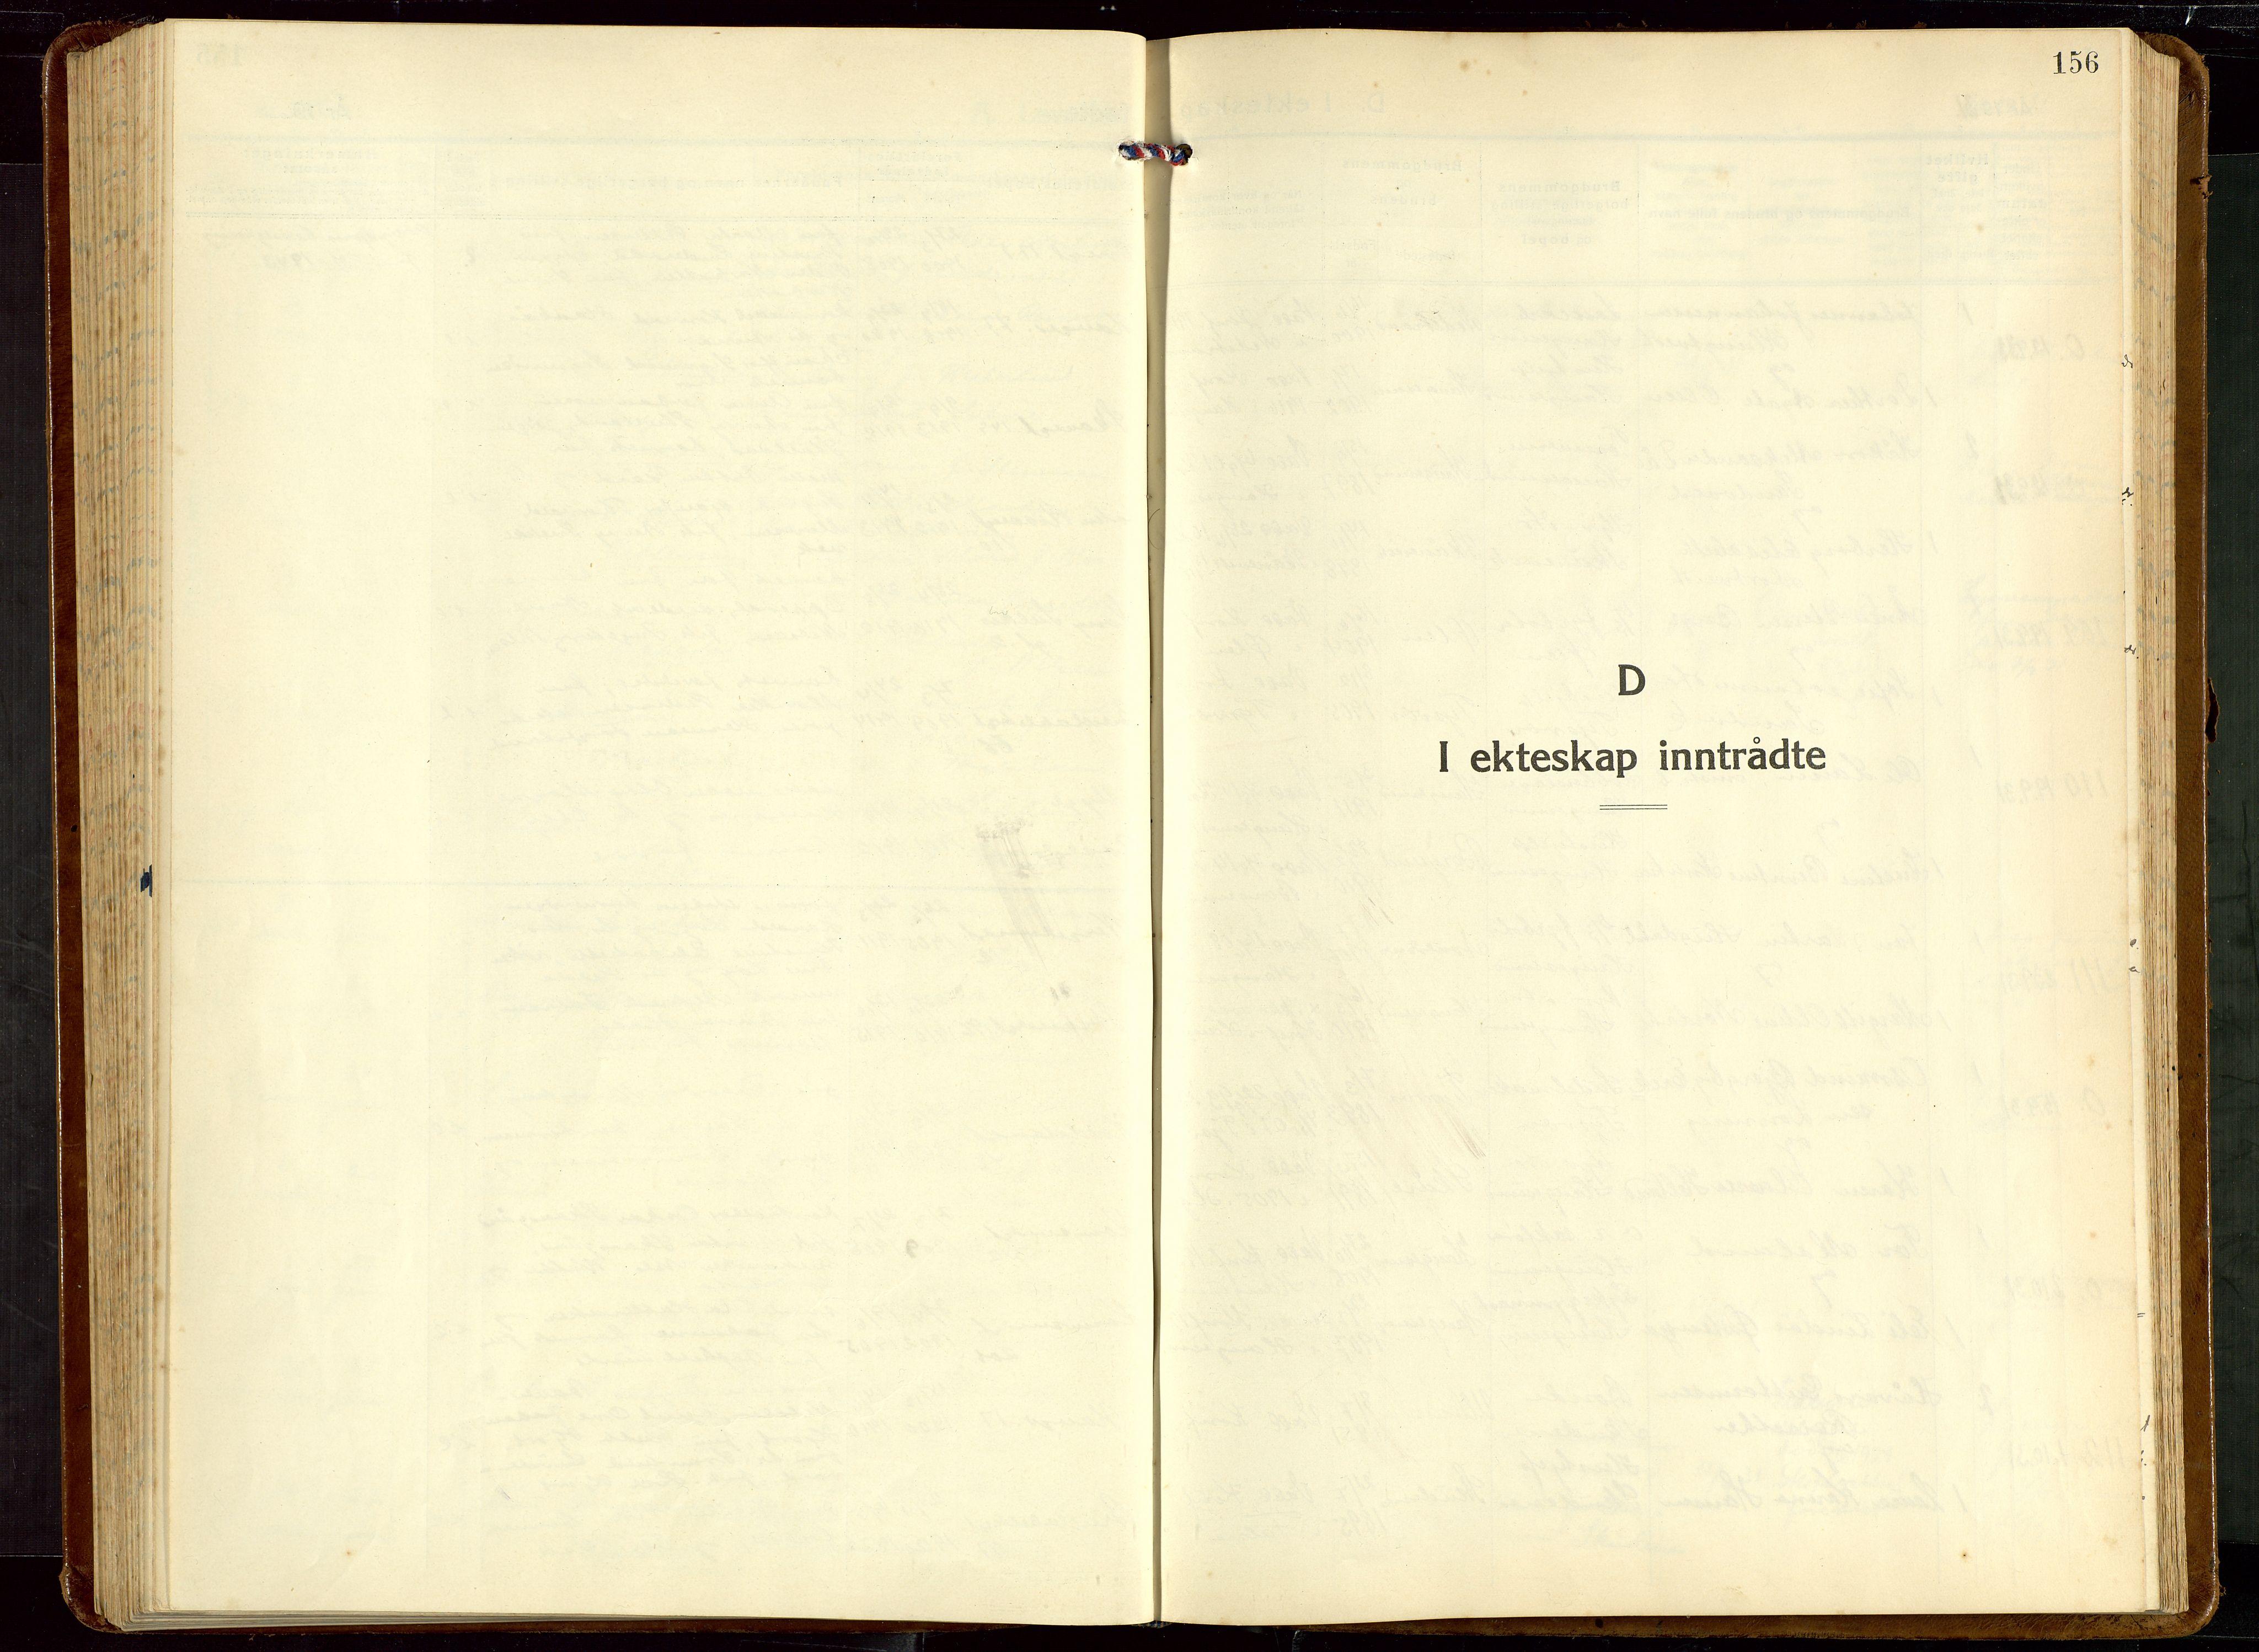 SAST, Haugesund sokneprestkontor, H/Ha/Hab/L0013: Klokkerbok nr. B 13, 1931-1943, s. 156